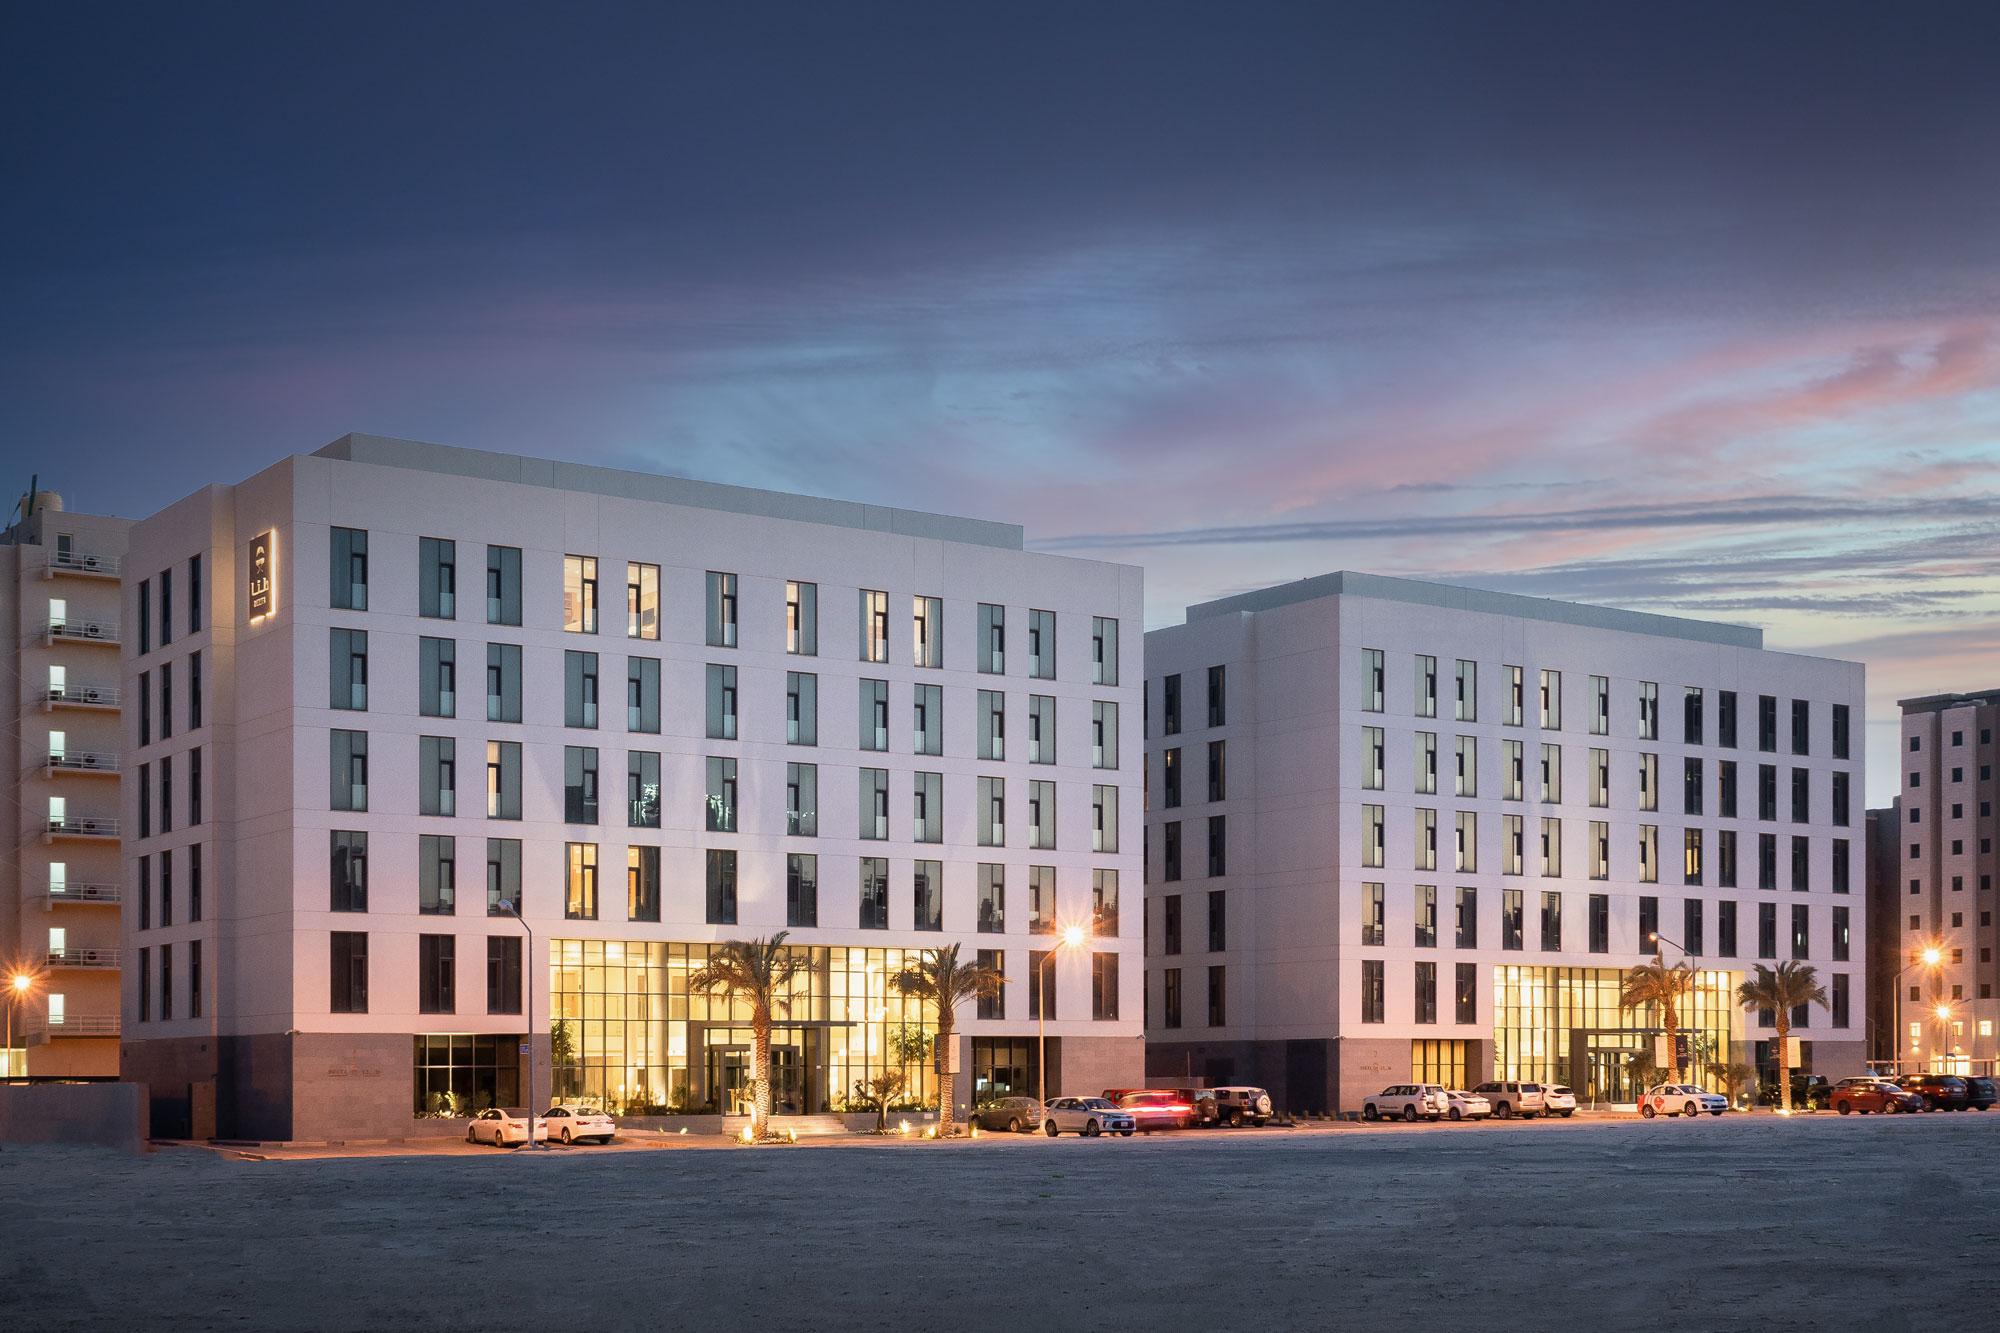 Delta Hotel Apartments buildings image